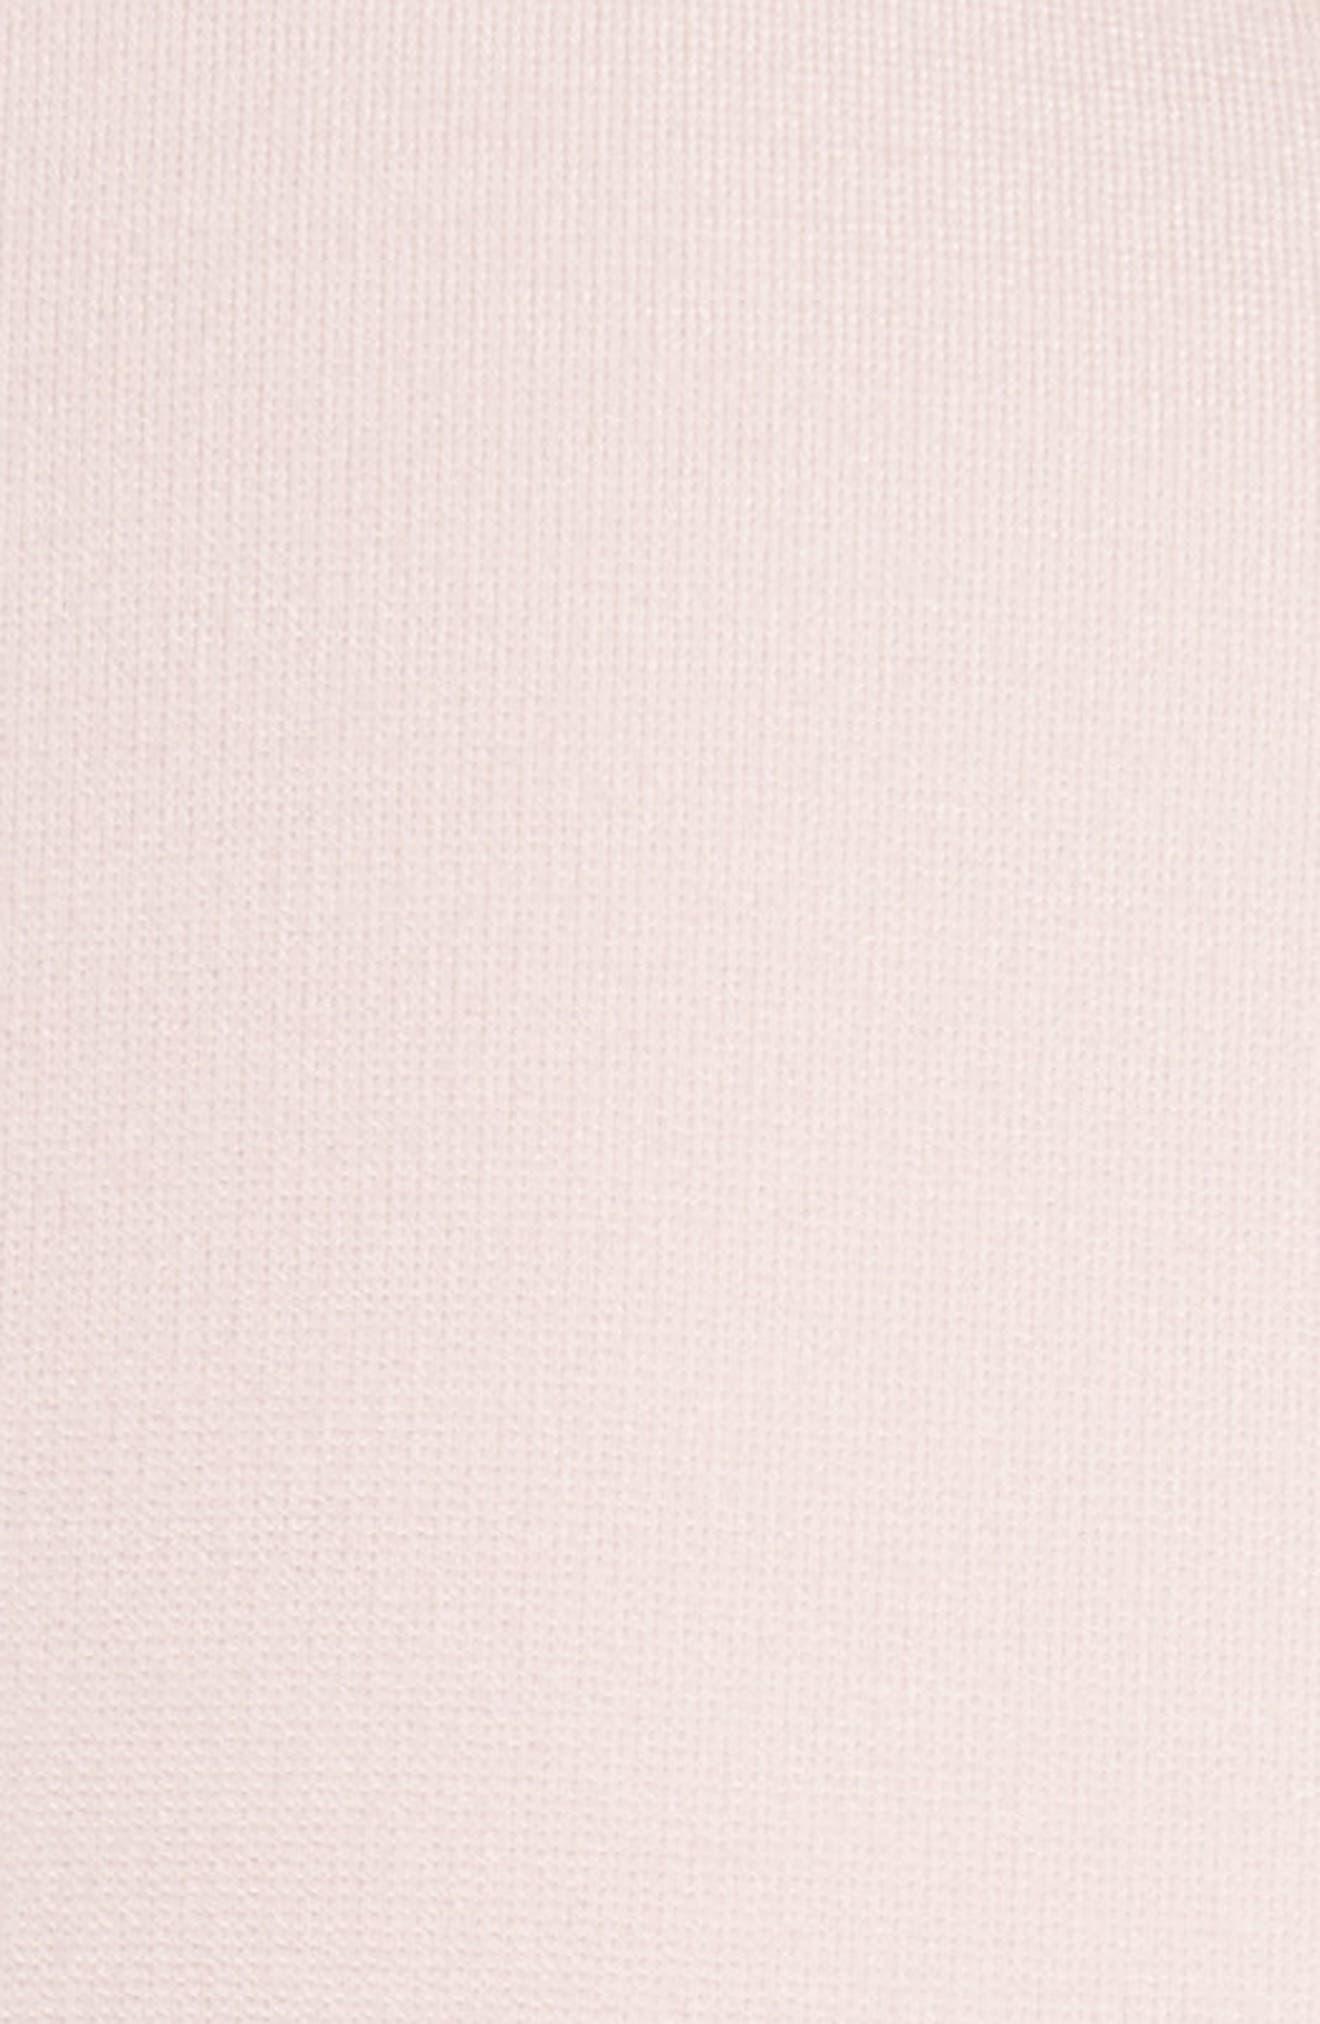 Eloquent Jacquard Skater Dress,                             Alternate thumbnail 5, color,                             Pale Pink